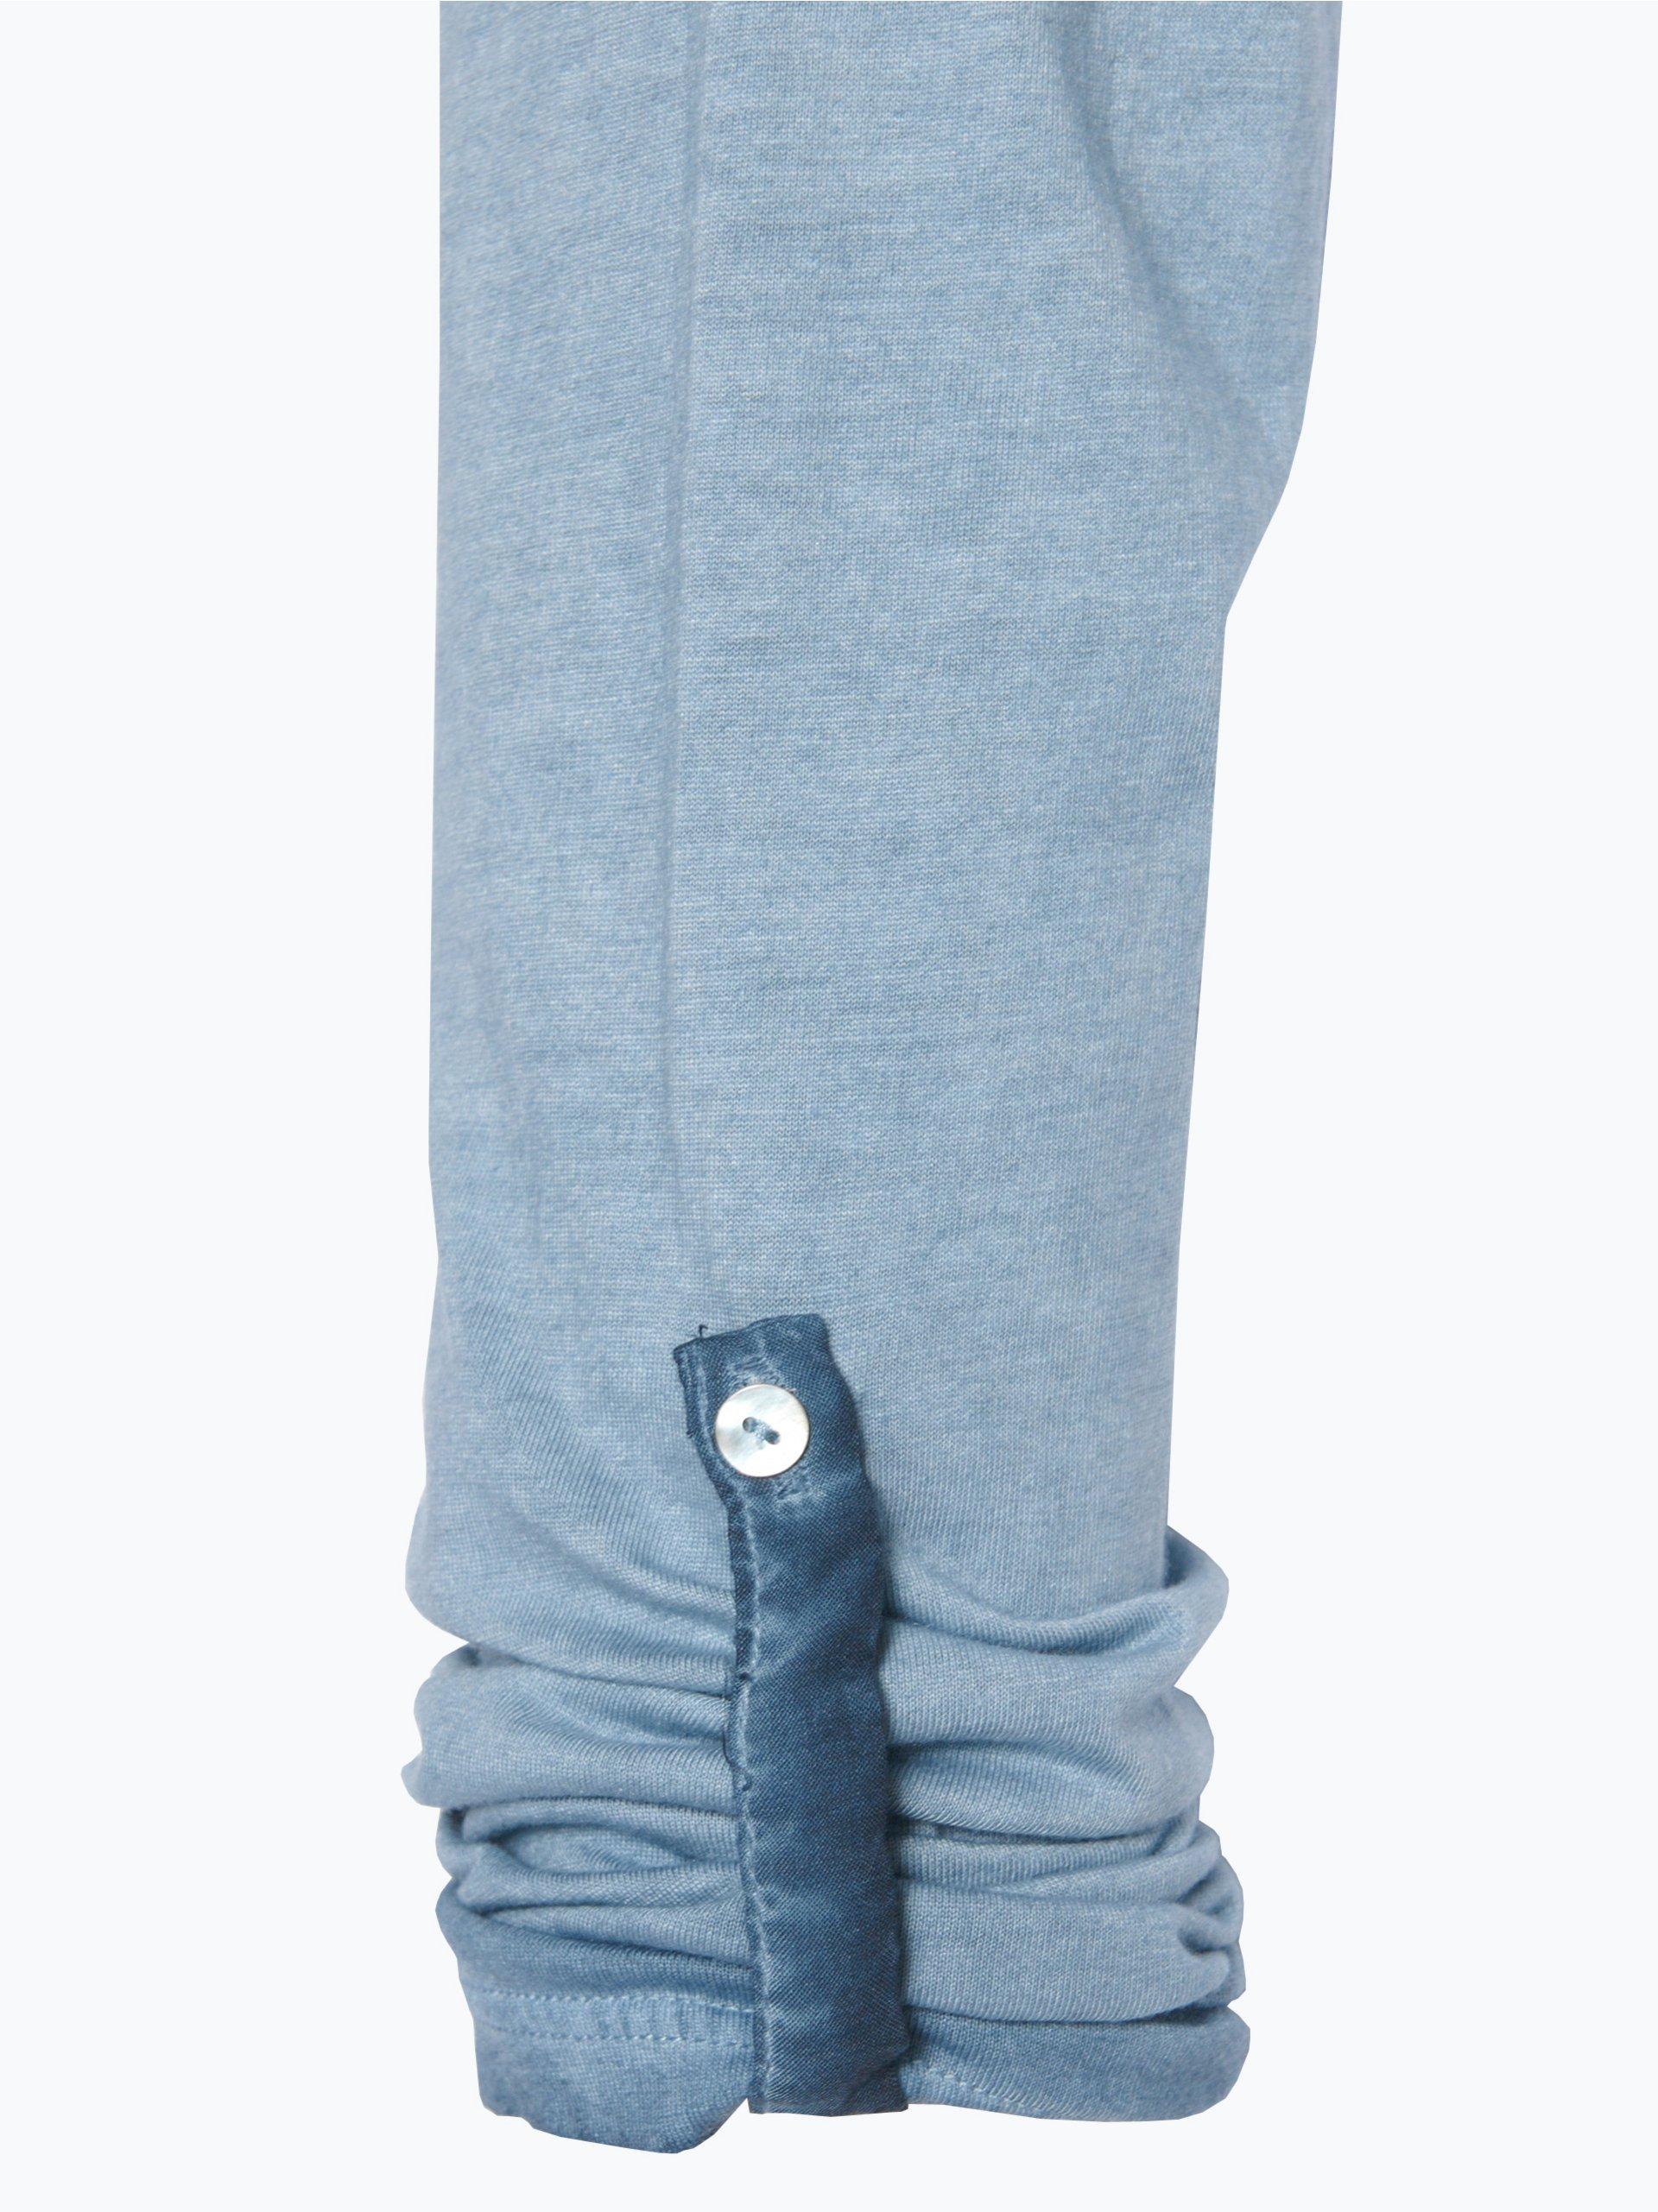 esprit casual damen langarmshirt hellblau uni online kaufen peek und cloppenburg de. Black Bedroom Furniture Sets. Home Design Ideas